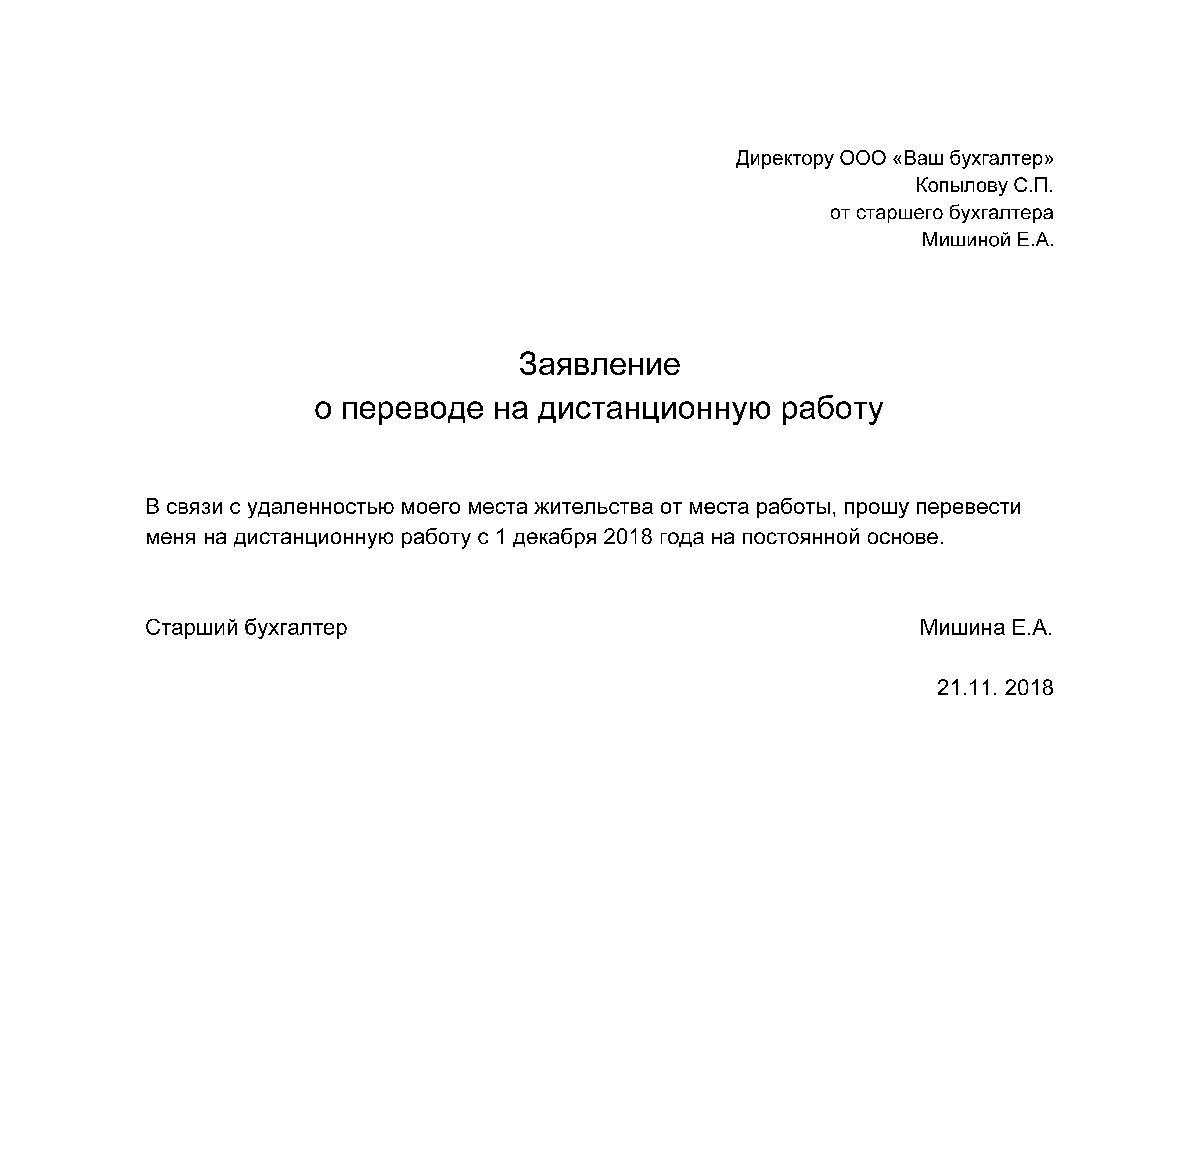 zav1.png